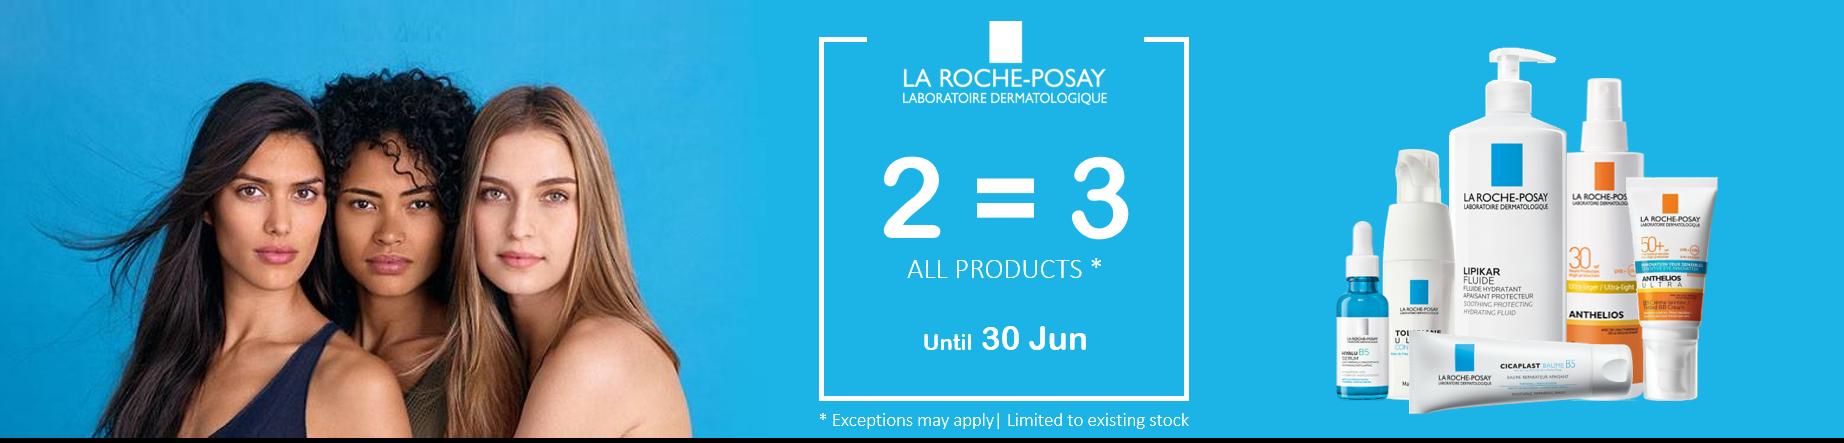 La Roche-Posay • 2 = 3